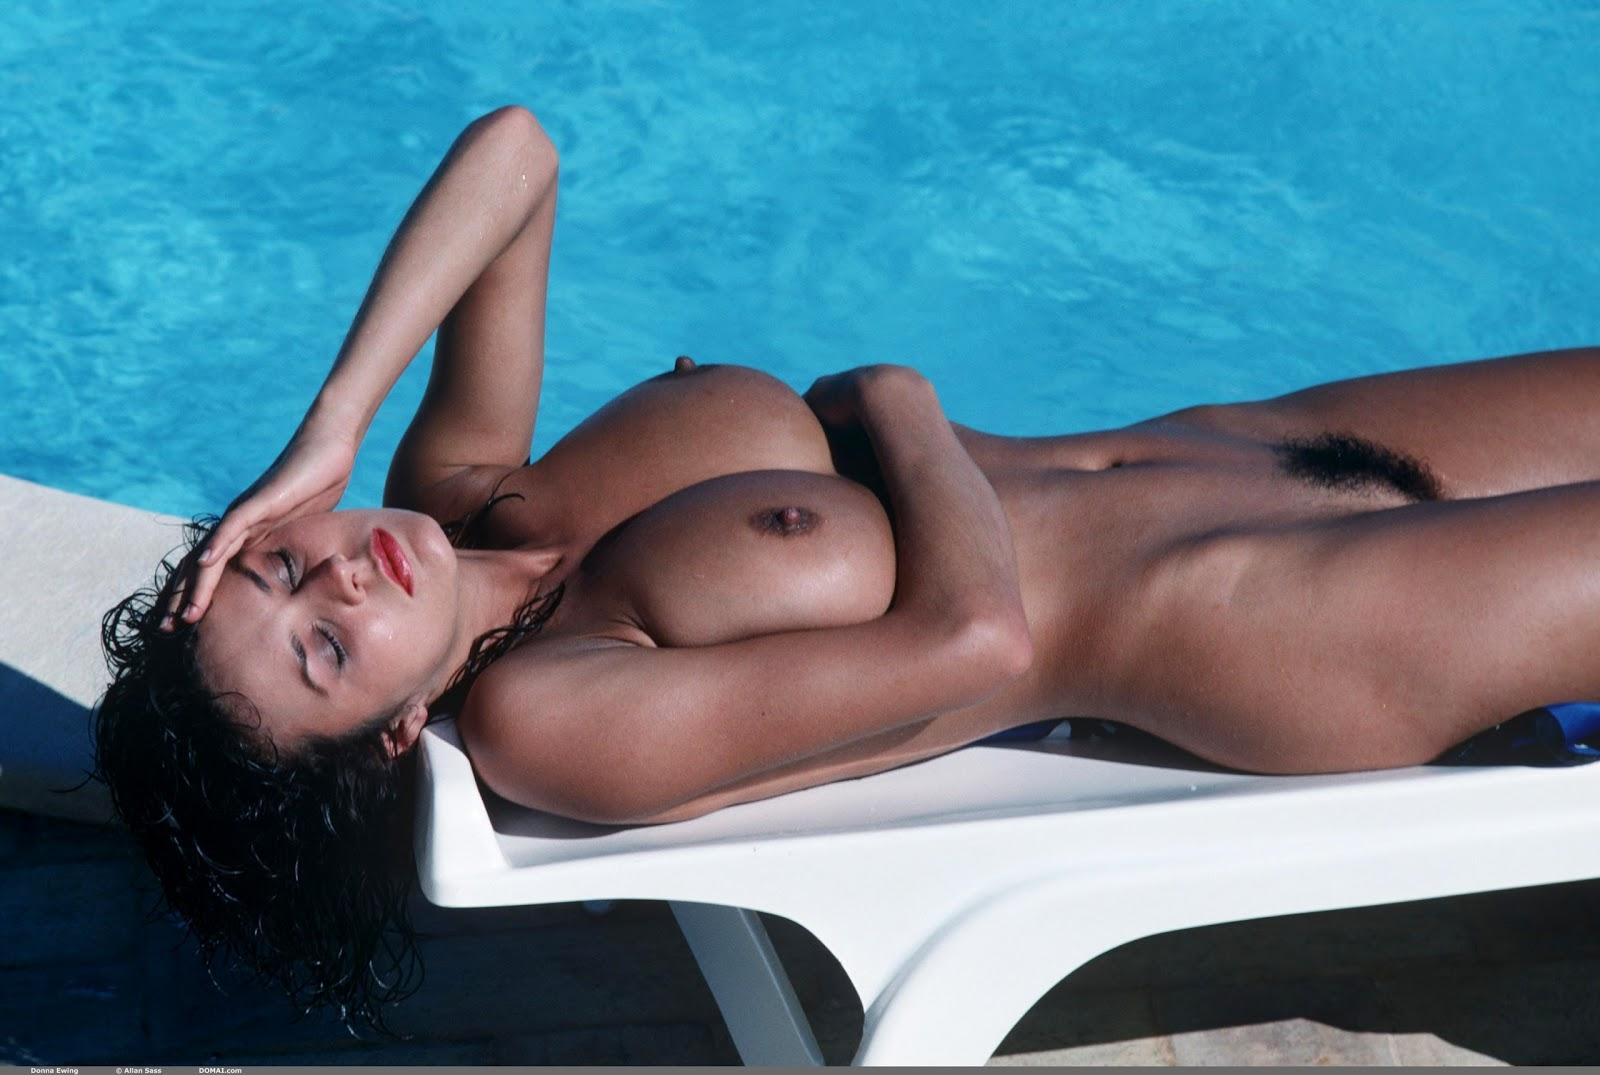 Kimberley garner nude the fappening